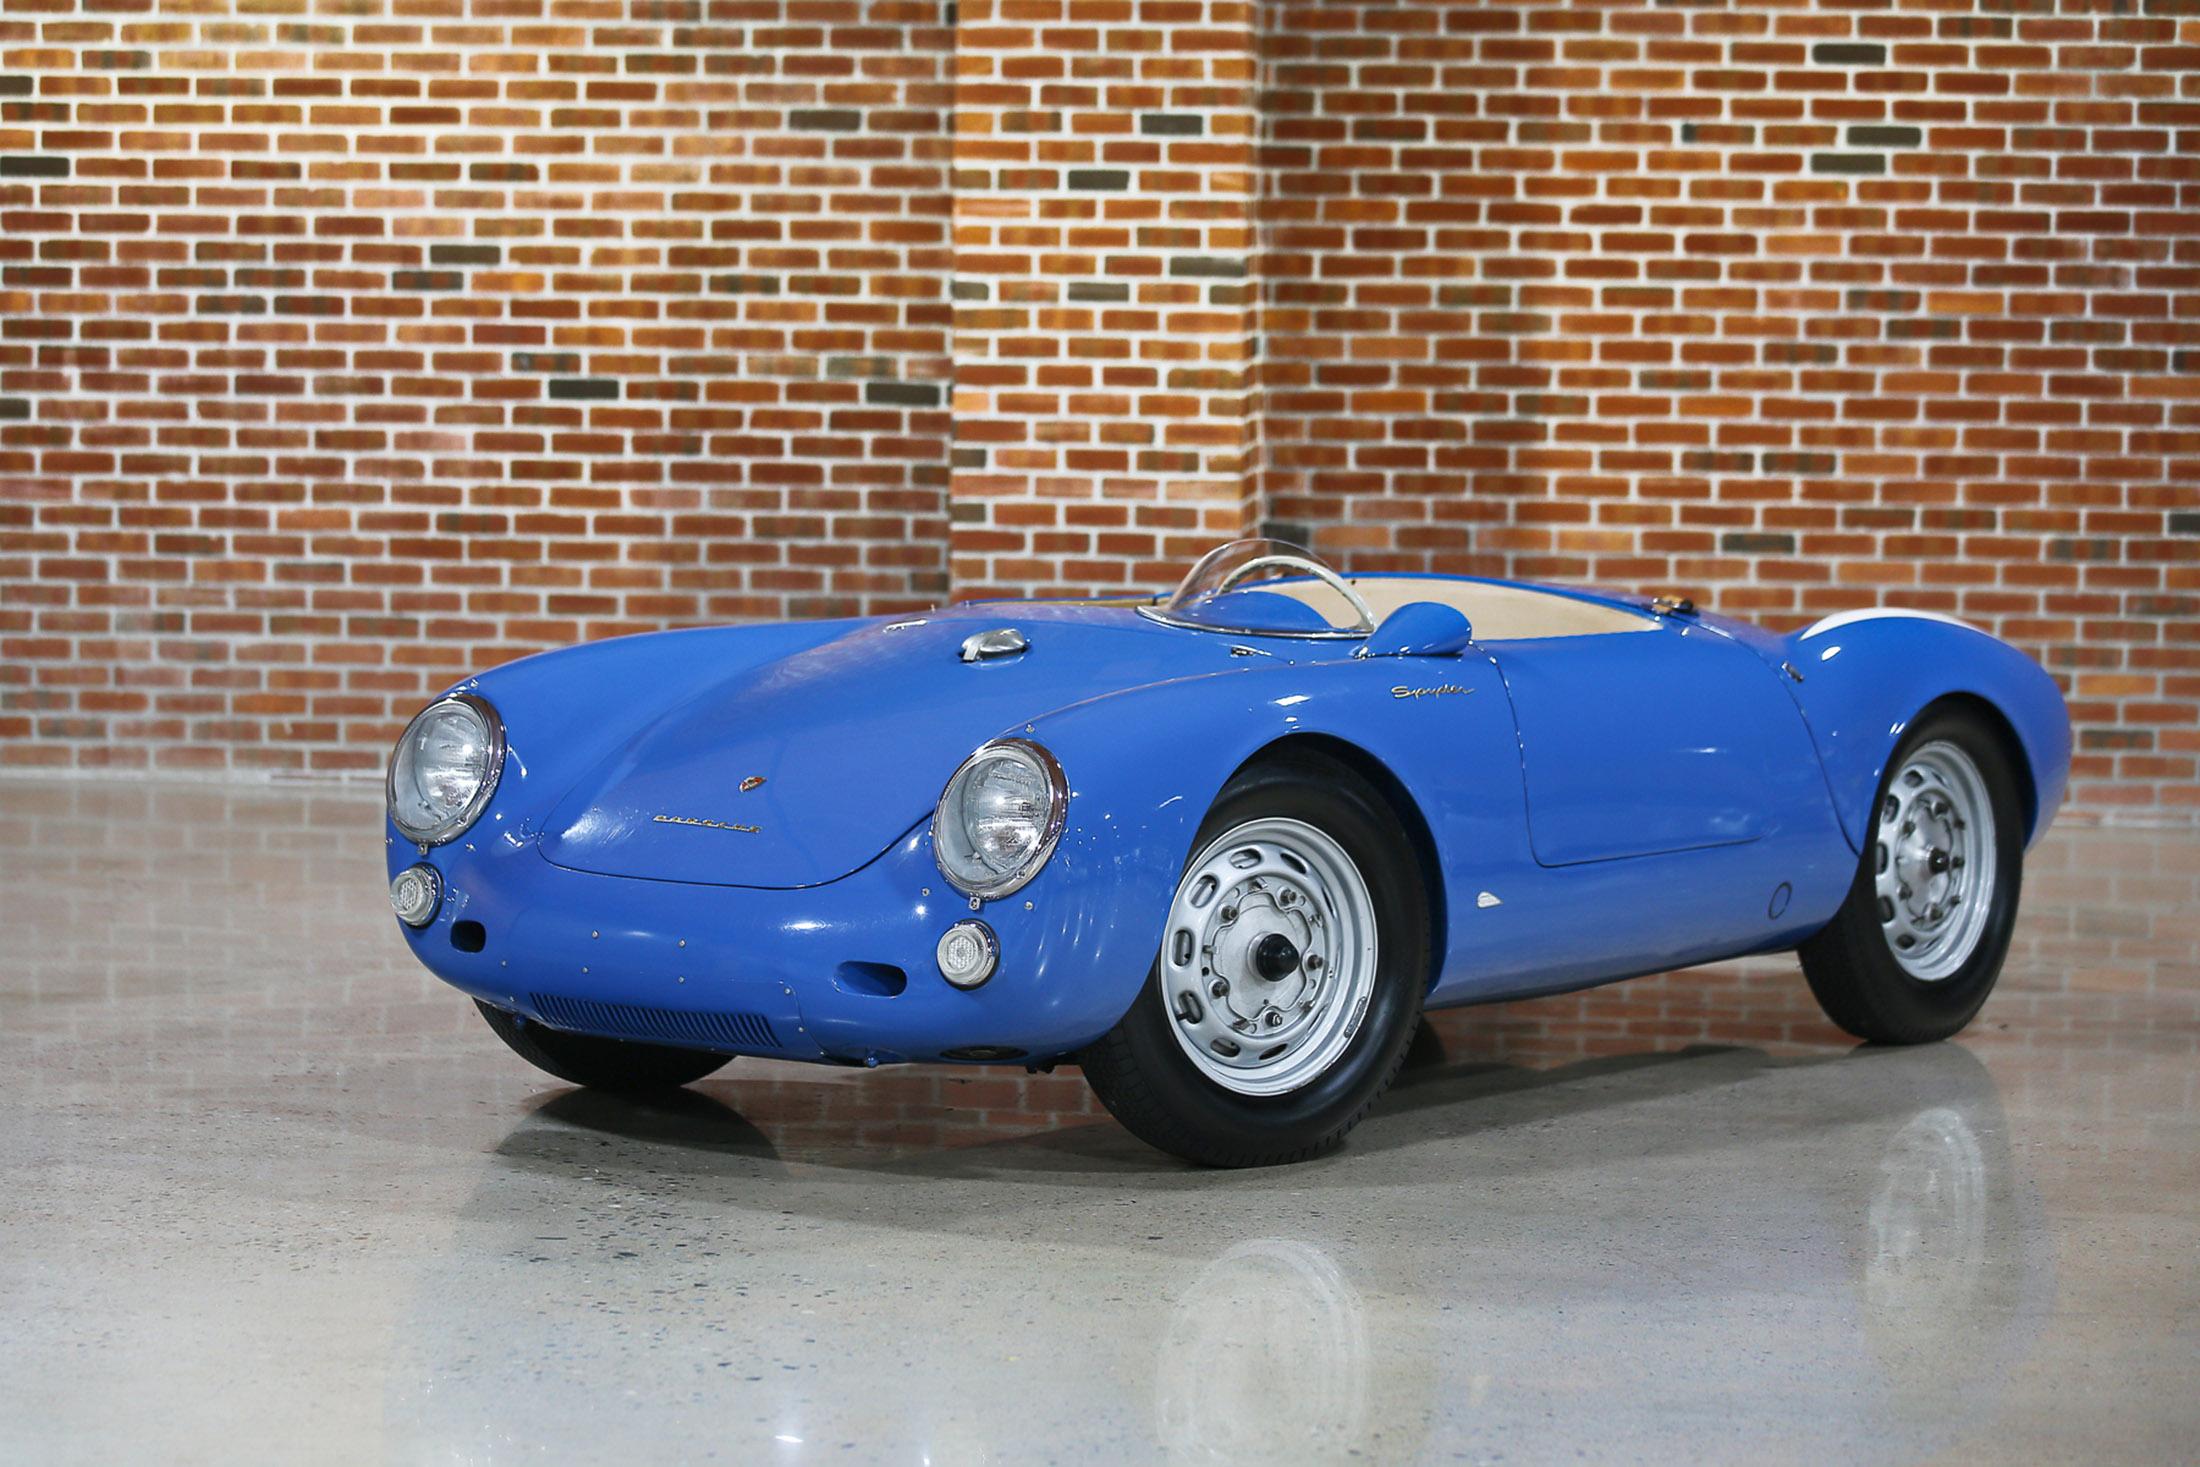 $5,335,000— 1955 Porsche 550 Spyder